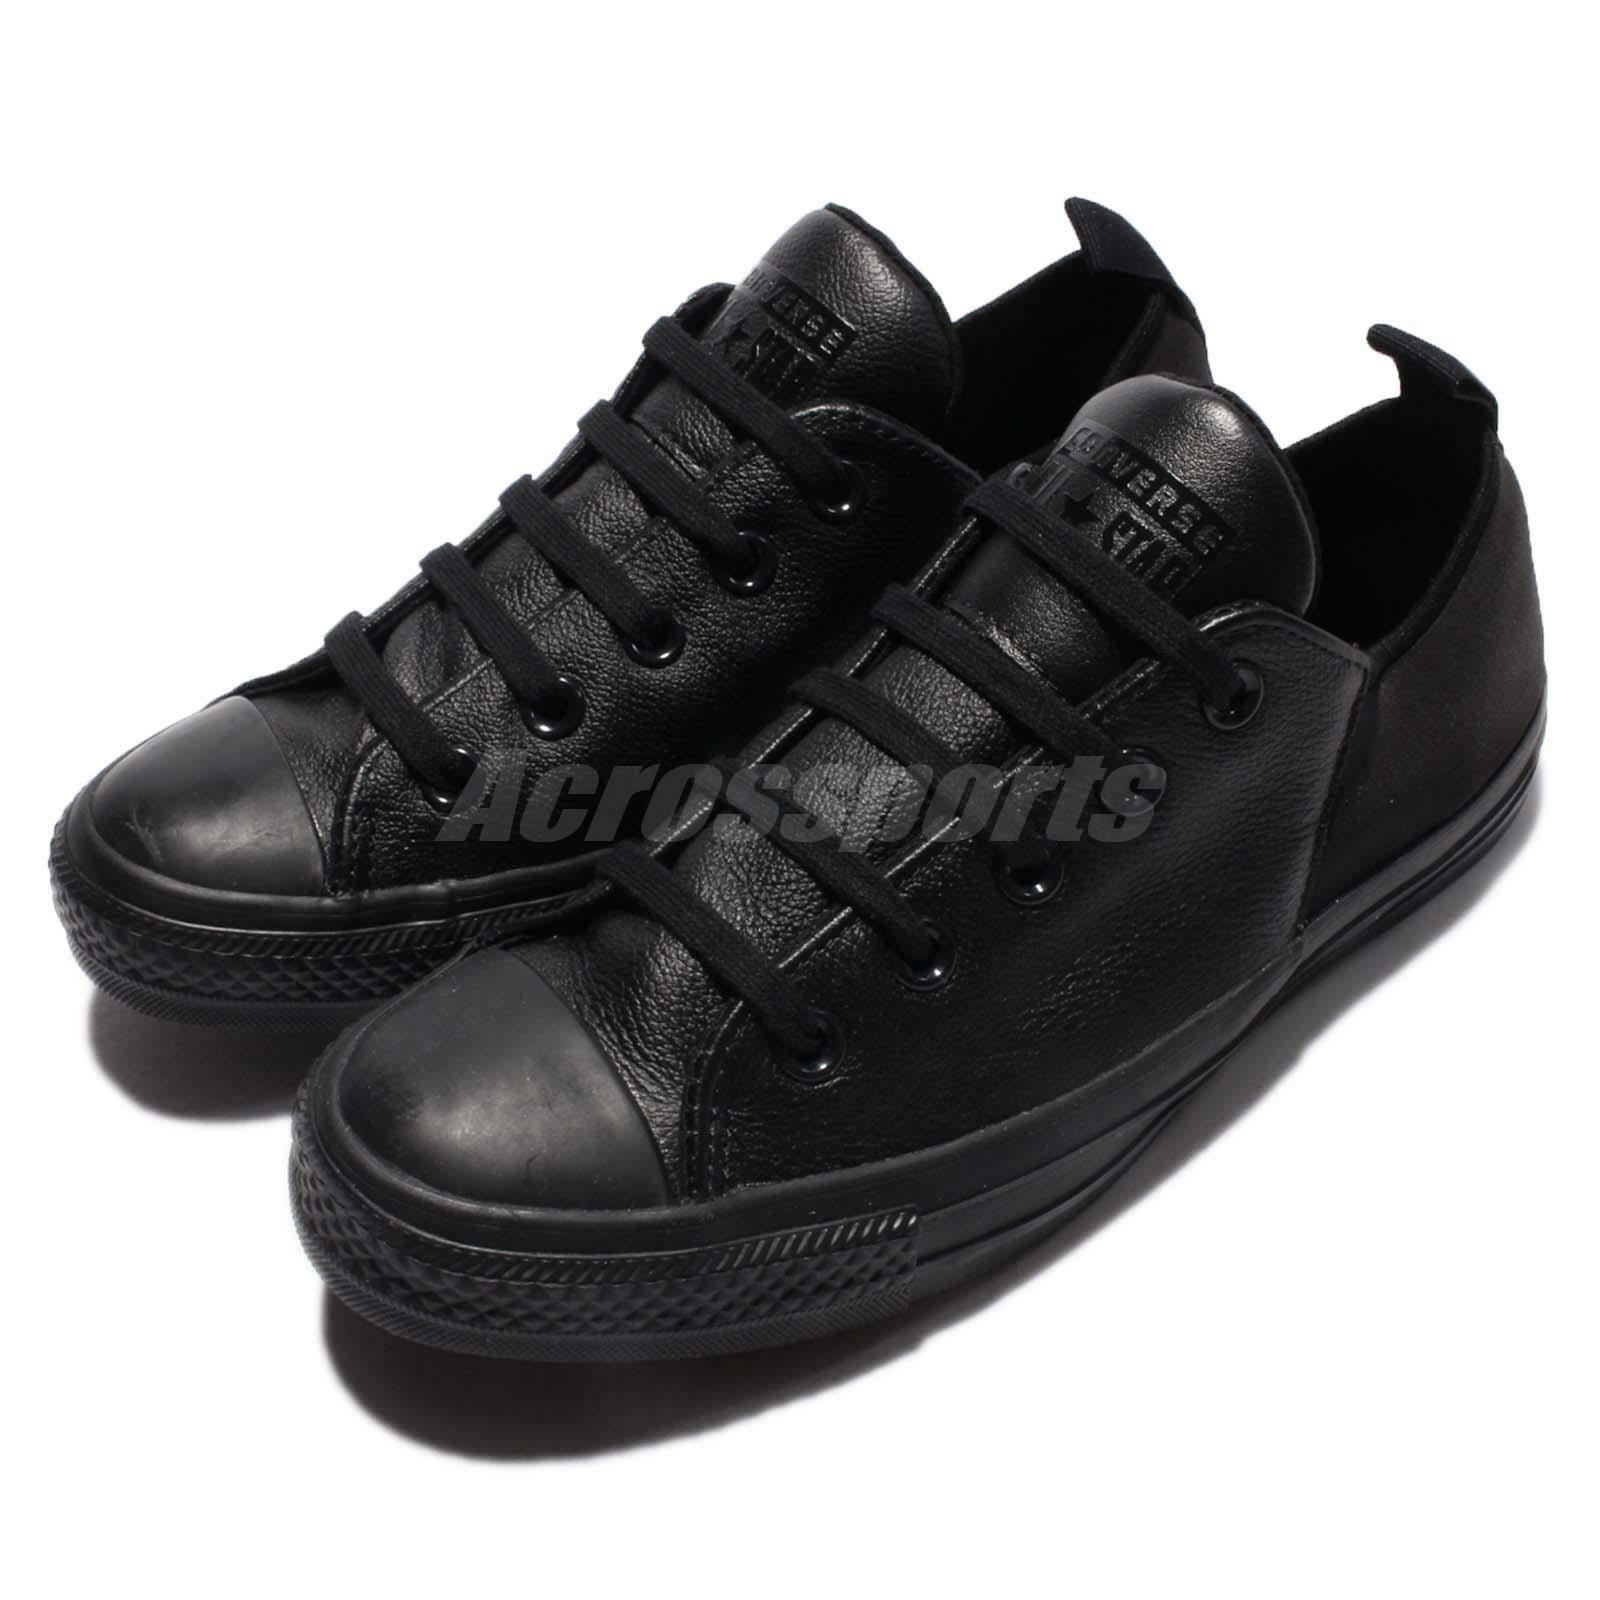 Converse Chuck Taylor All Star Abbey Monochrome Leather Black Women Shoe 553380C